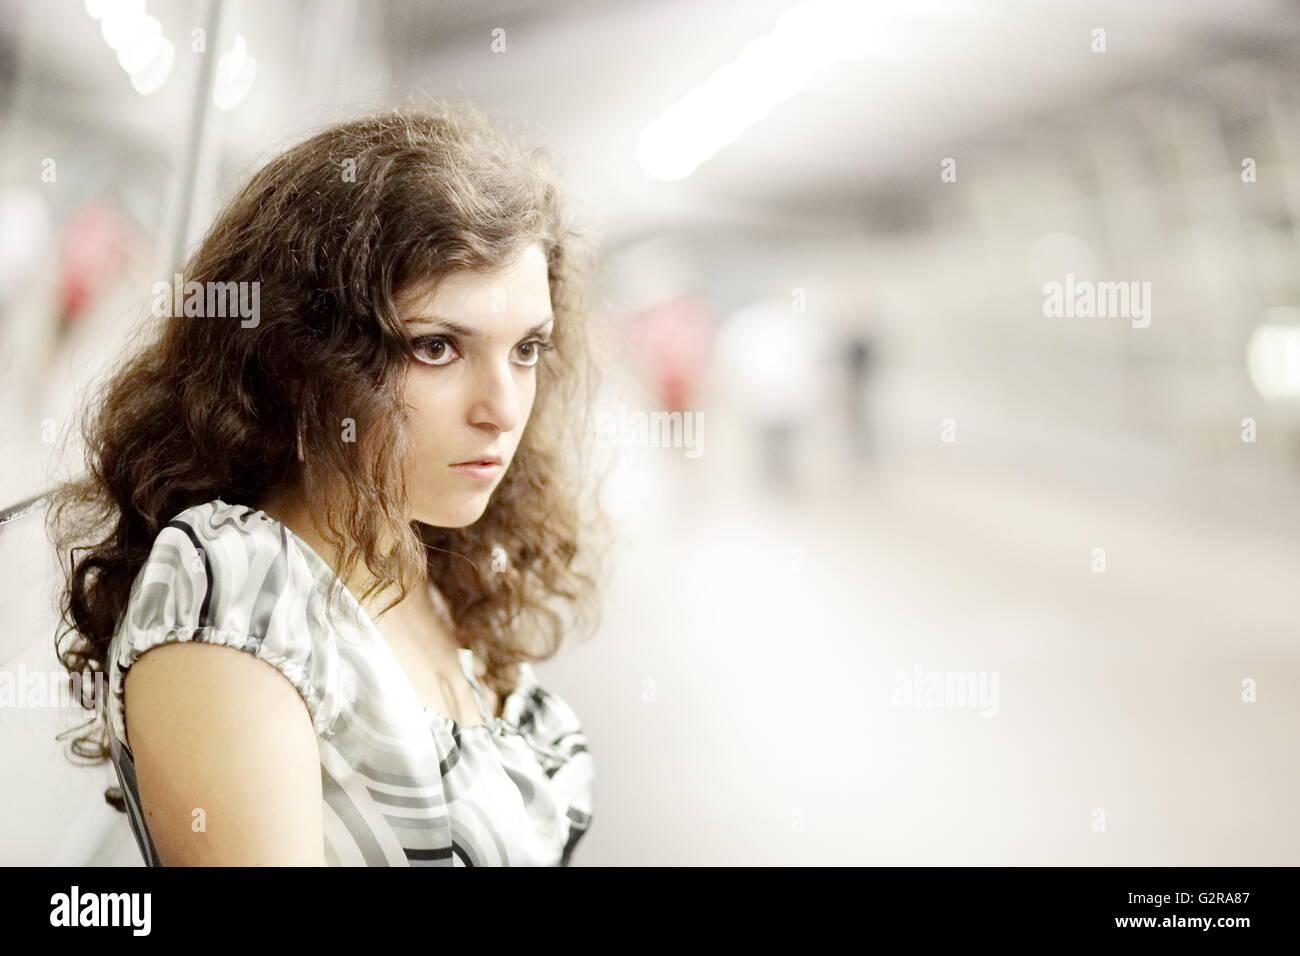 Young woman in a public space, Allgaeu, Kempten, Allgäu, Swabia, Bavaria, Germany - Stock Image